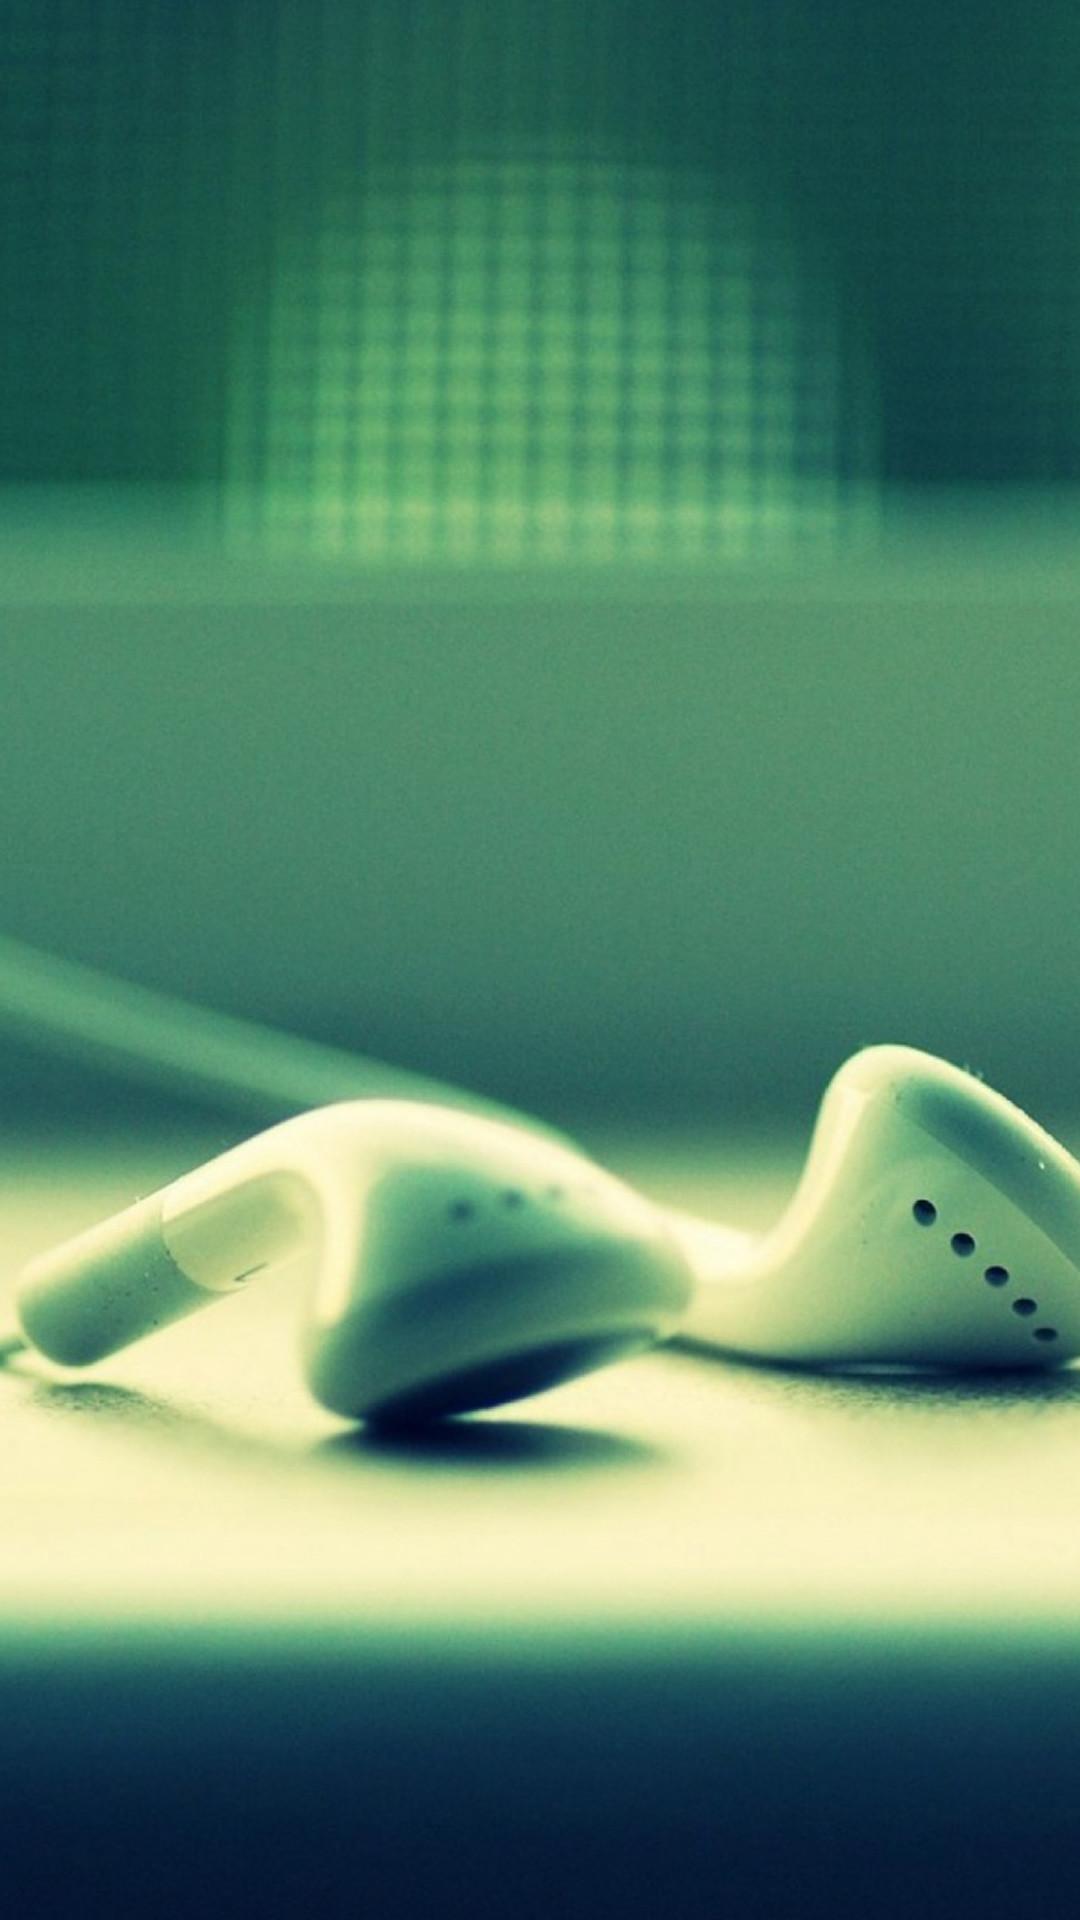 iPod Headphones Closeup #iPhone #6 #plus #wallpaper